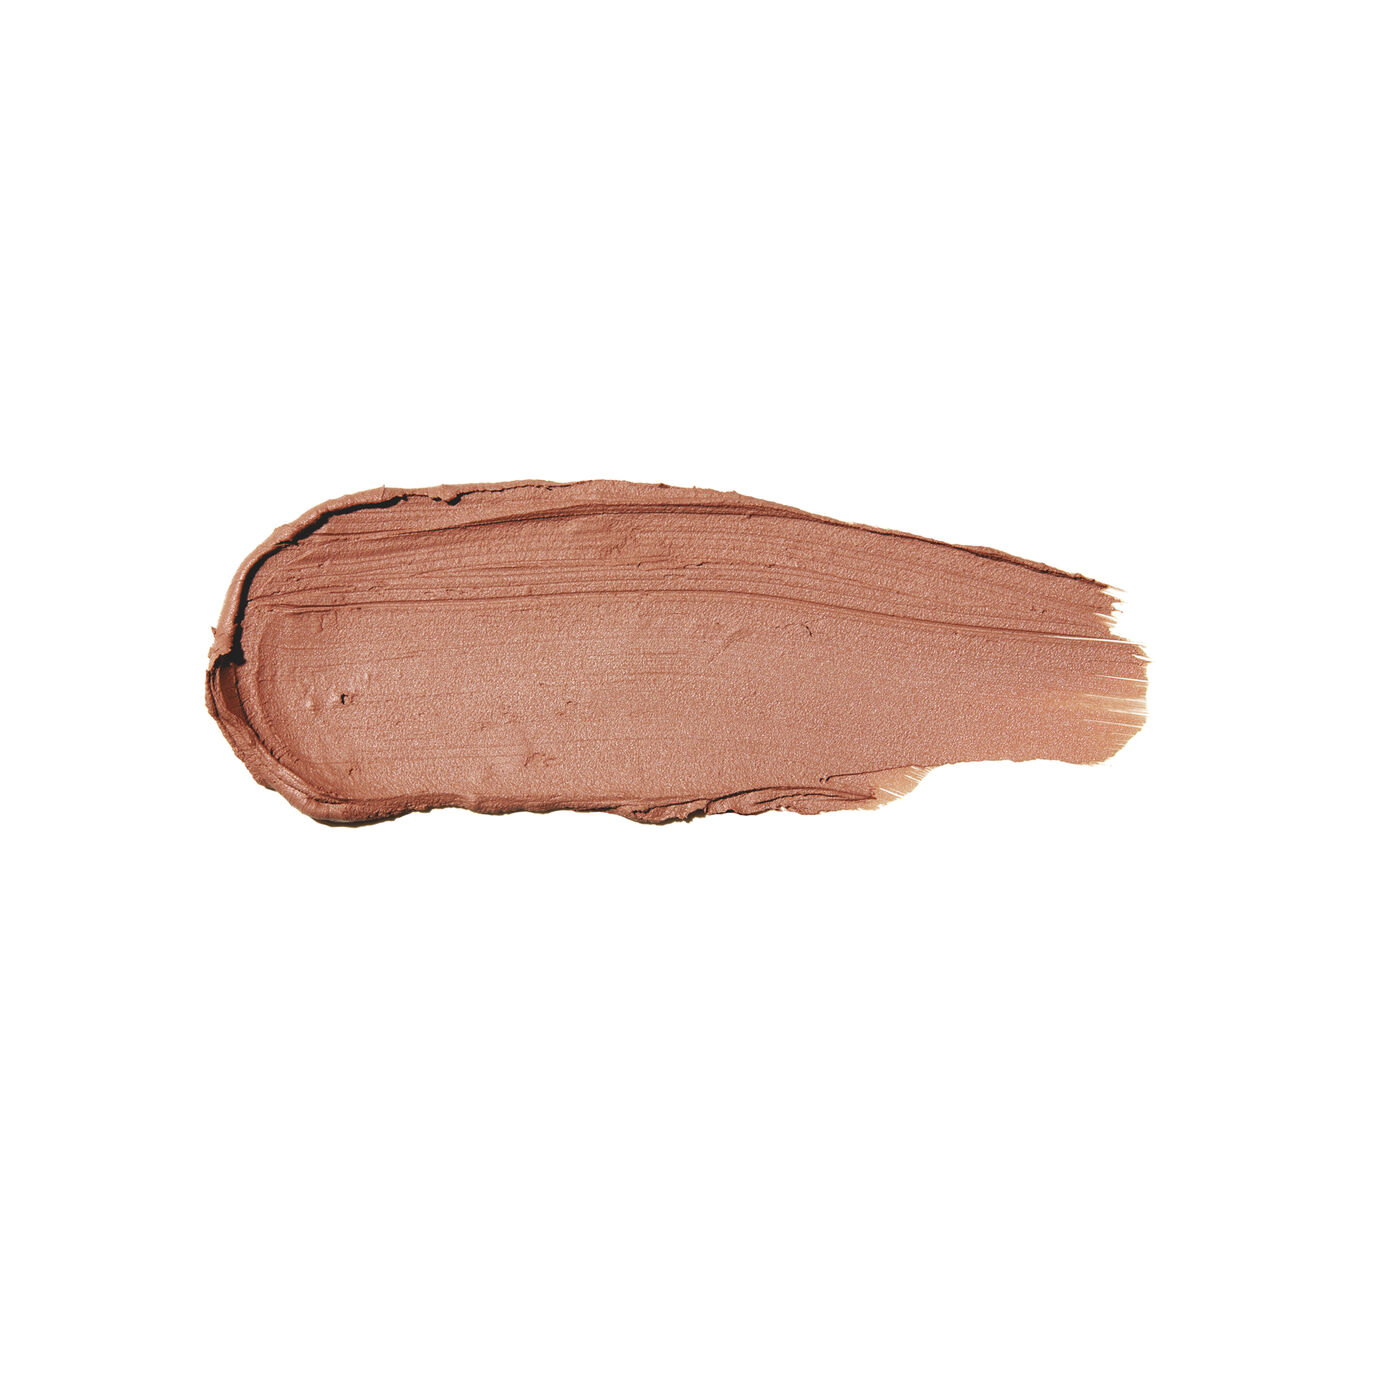 Anastasia Nude matte lipstick - nude